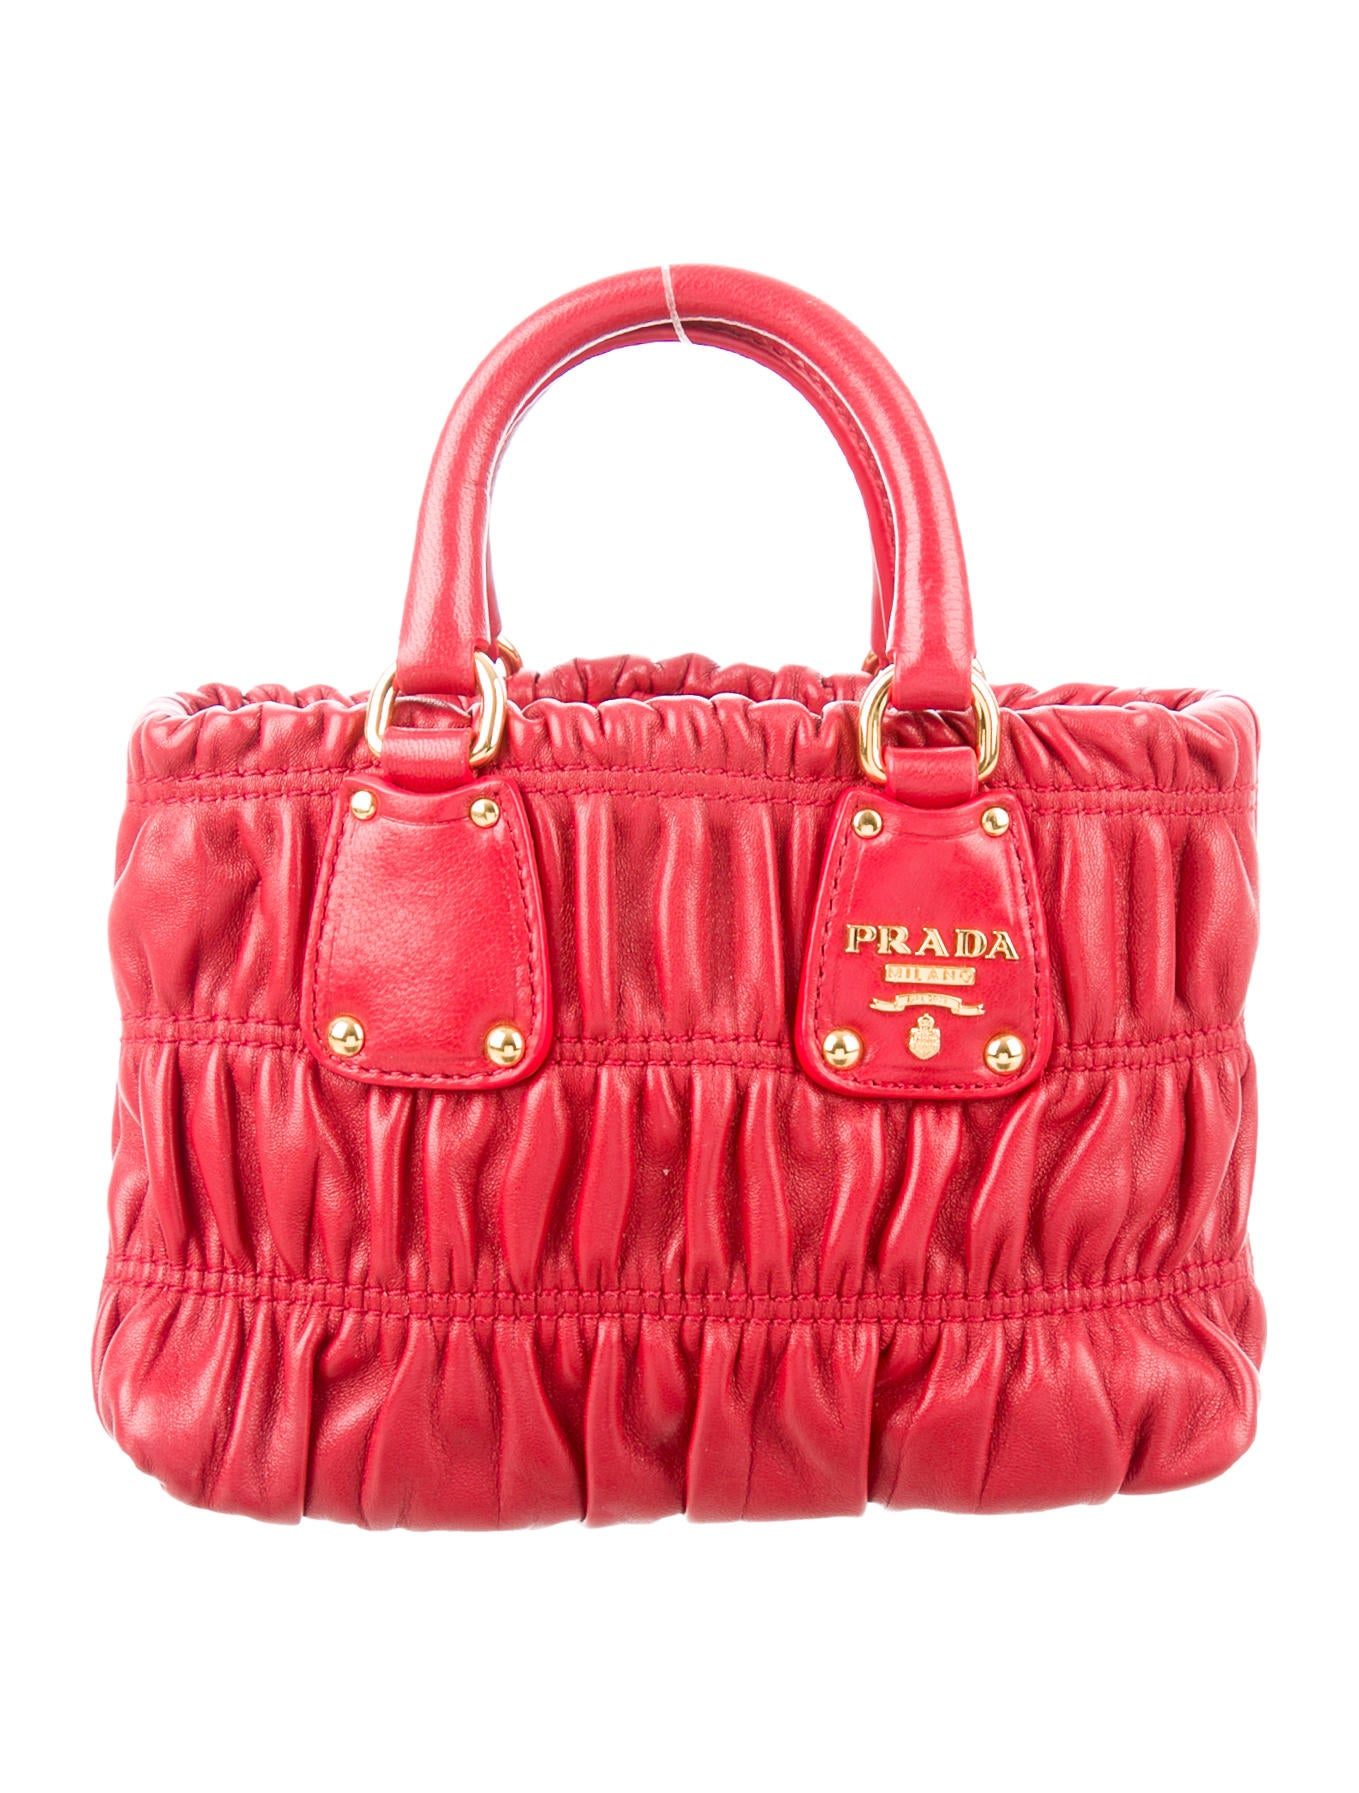 a1bd84f68d8e Prada Mini Nappa Gaufre Crossbody Bag - Handbags - PRA133942   The ...